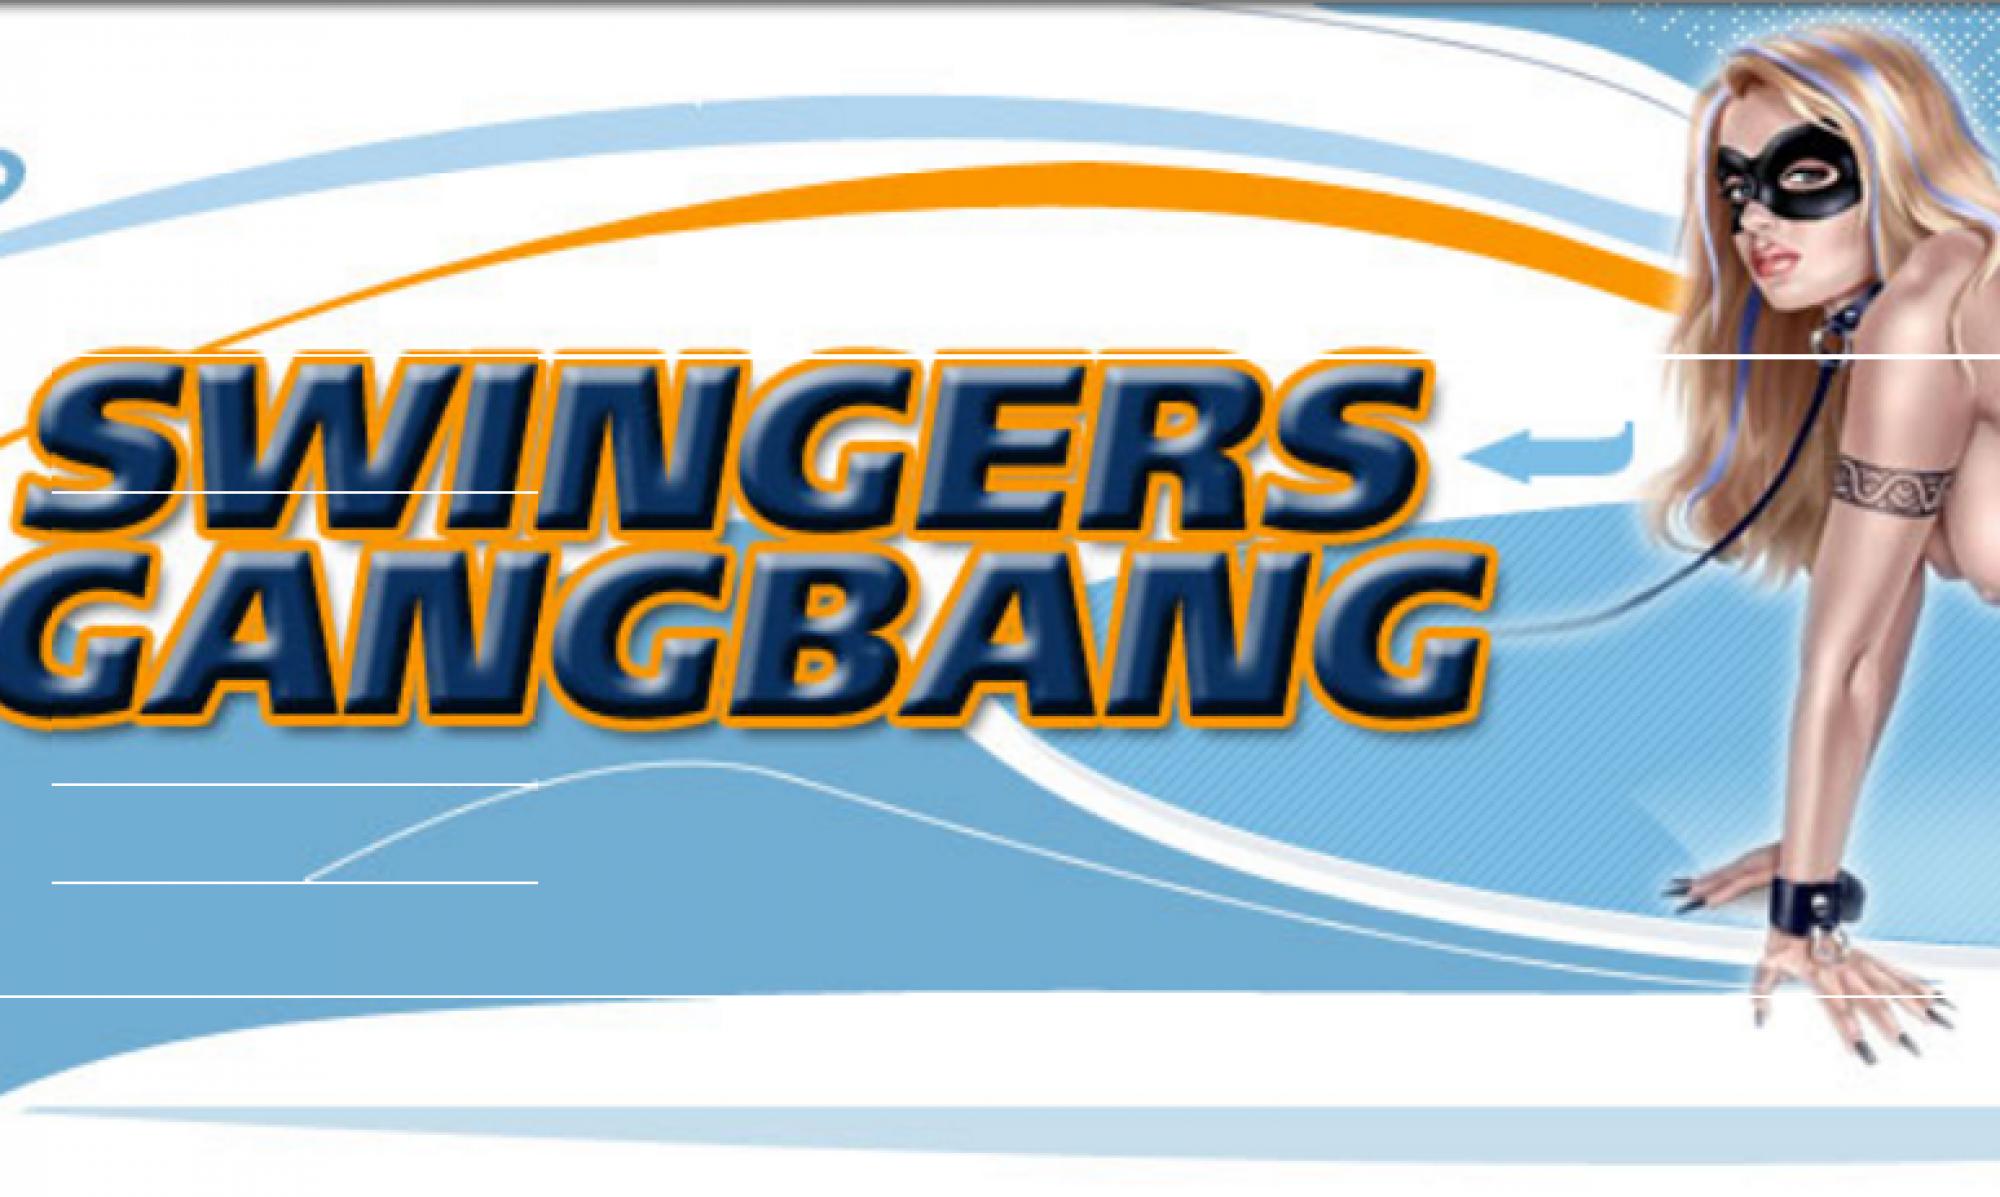 Swingersgangbang.nl